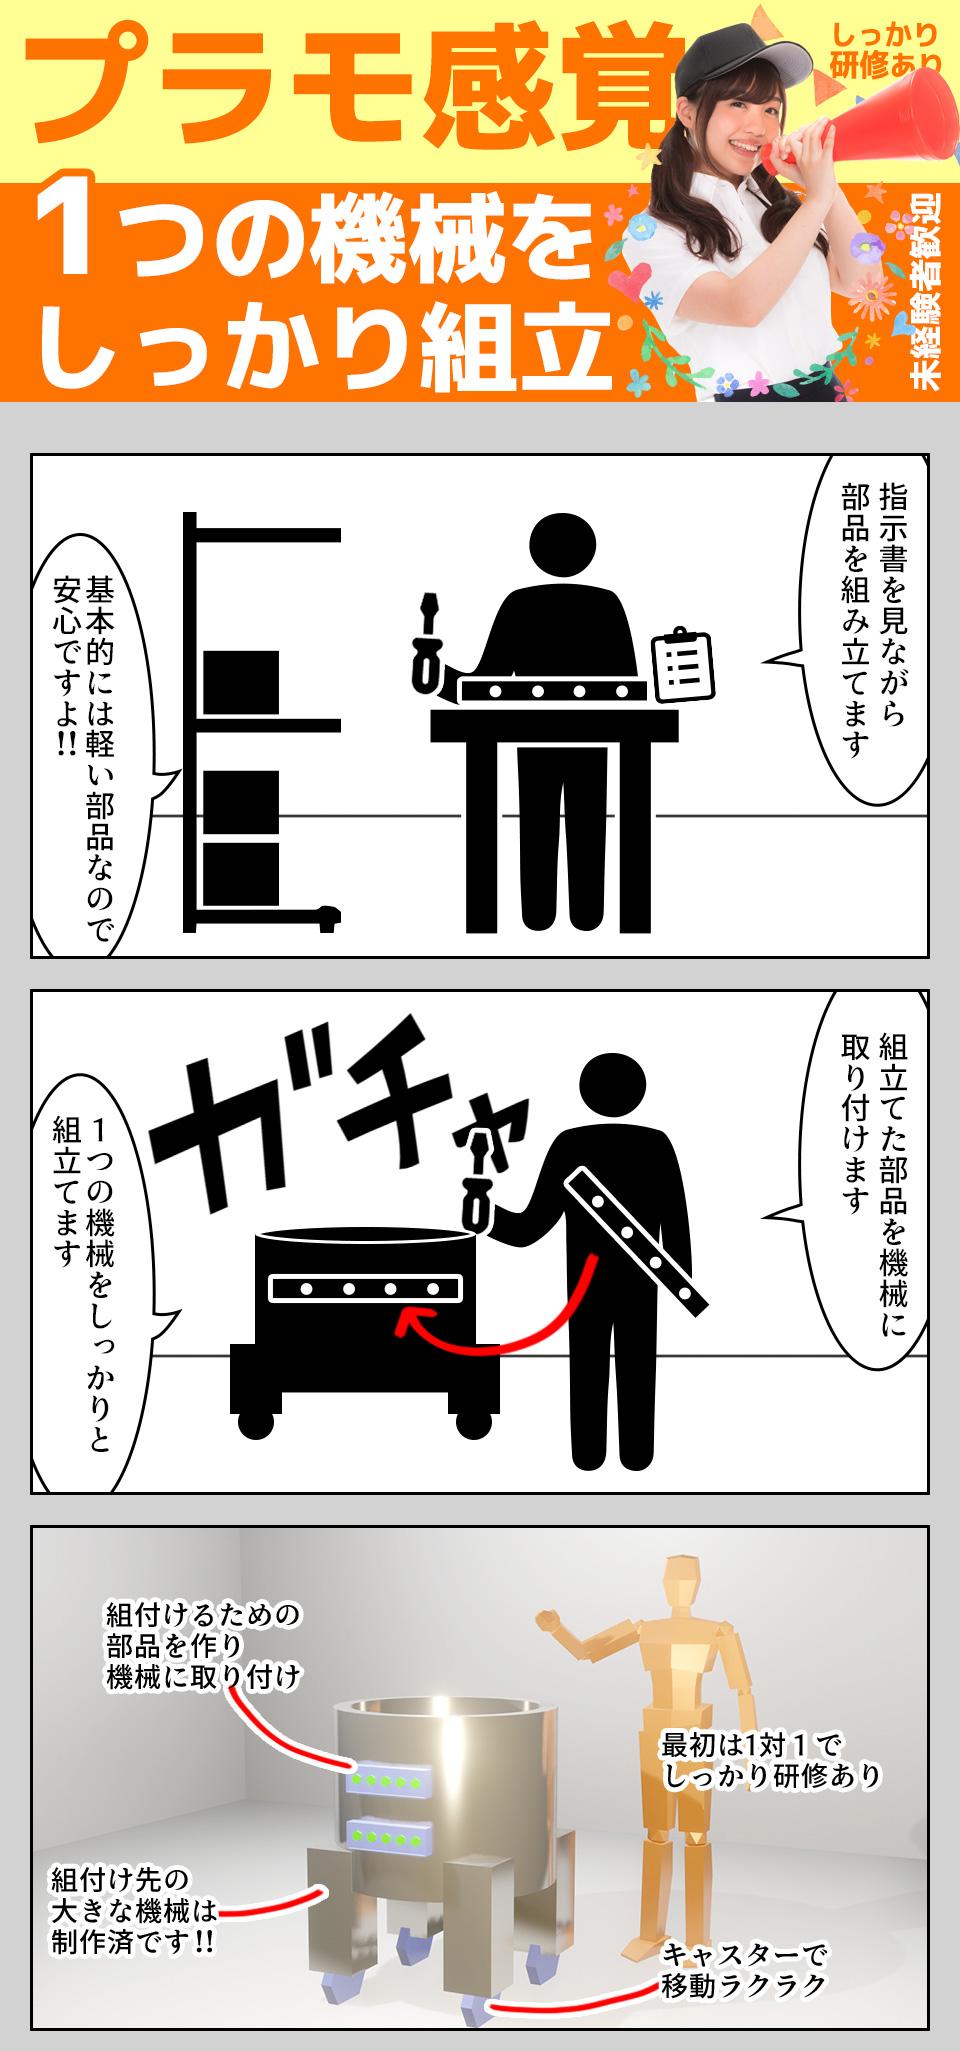 組付け・検査 石川県能美市の派遣社員求人